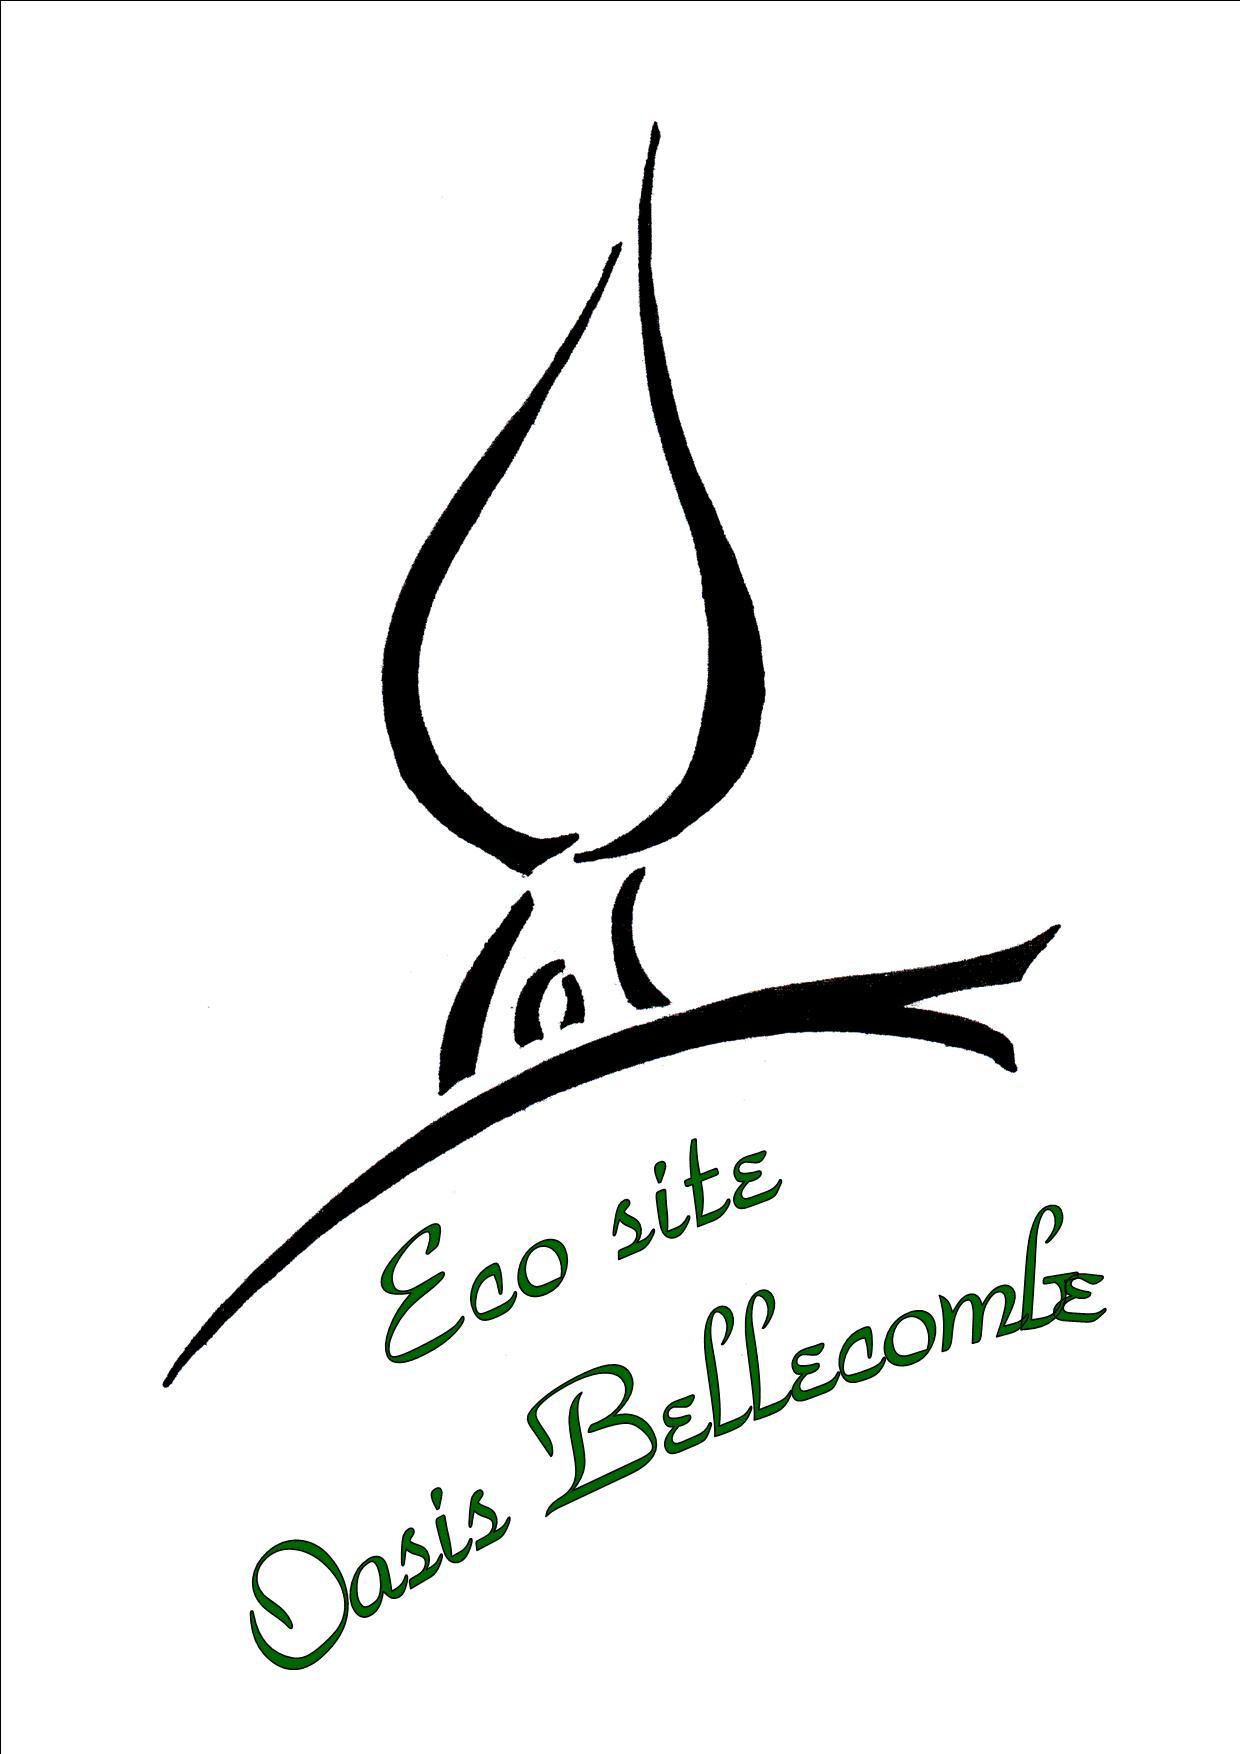 http://www.oasisbellecombe.com/